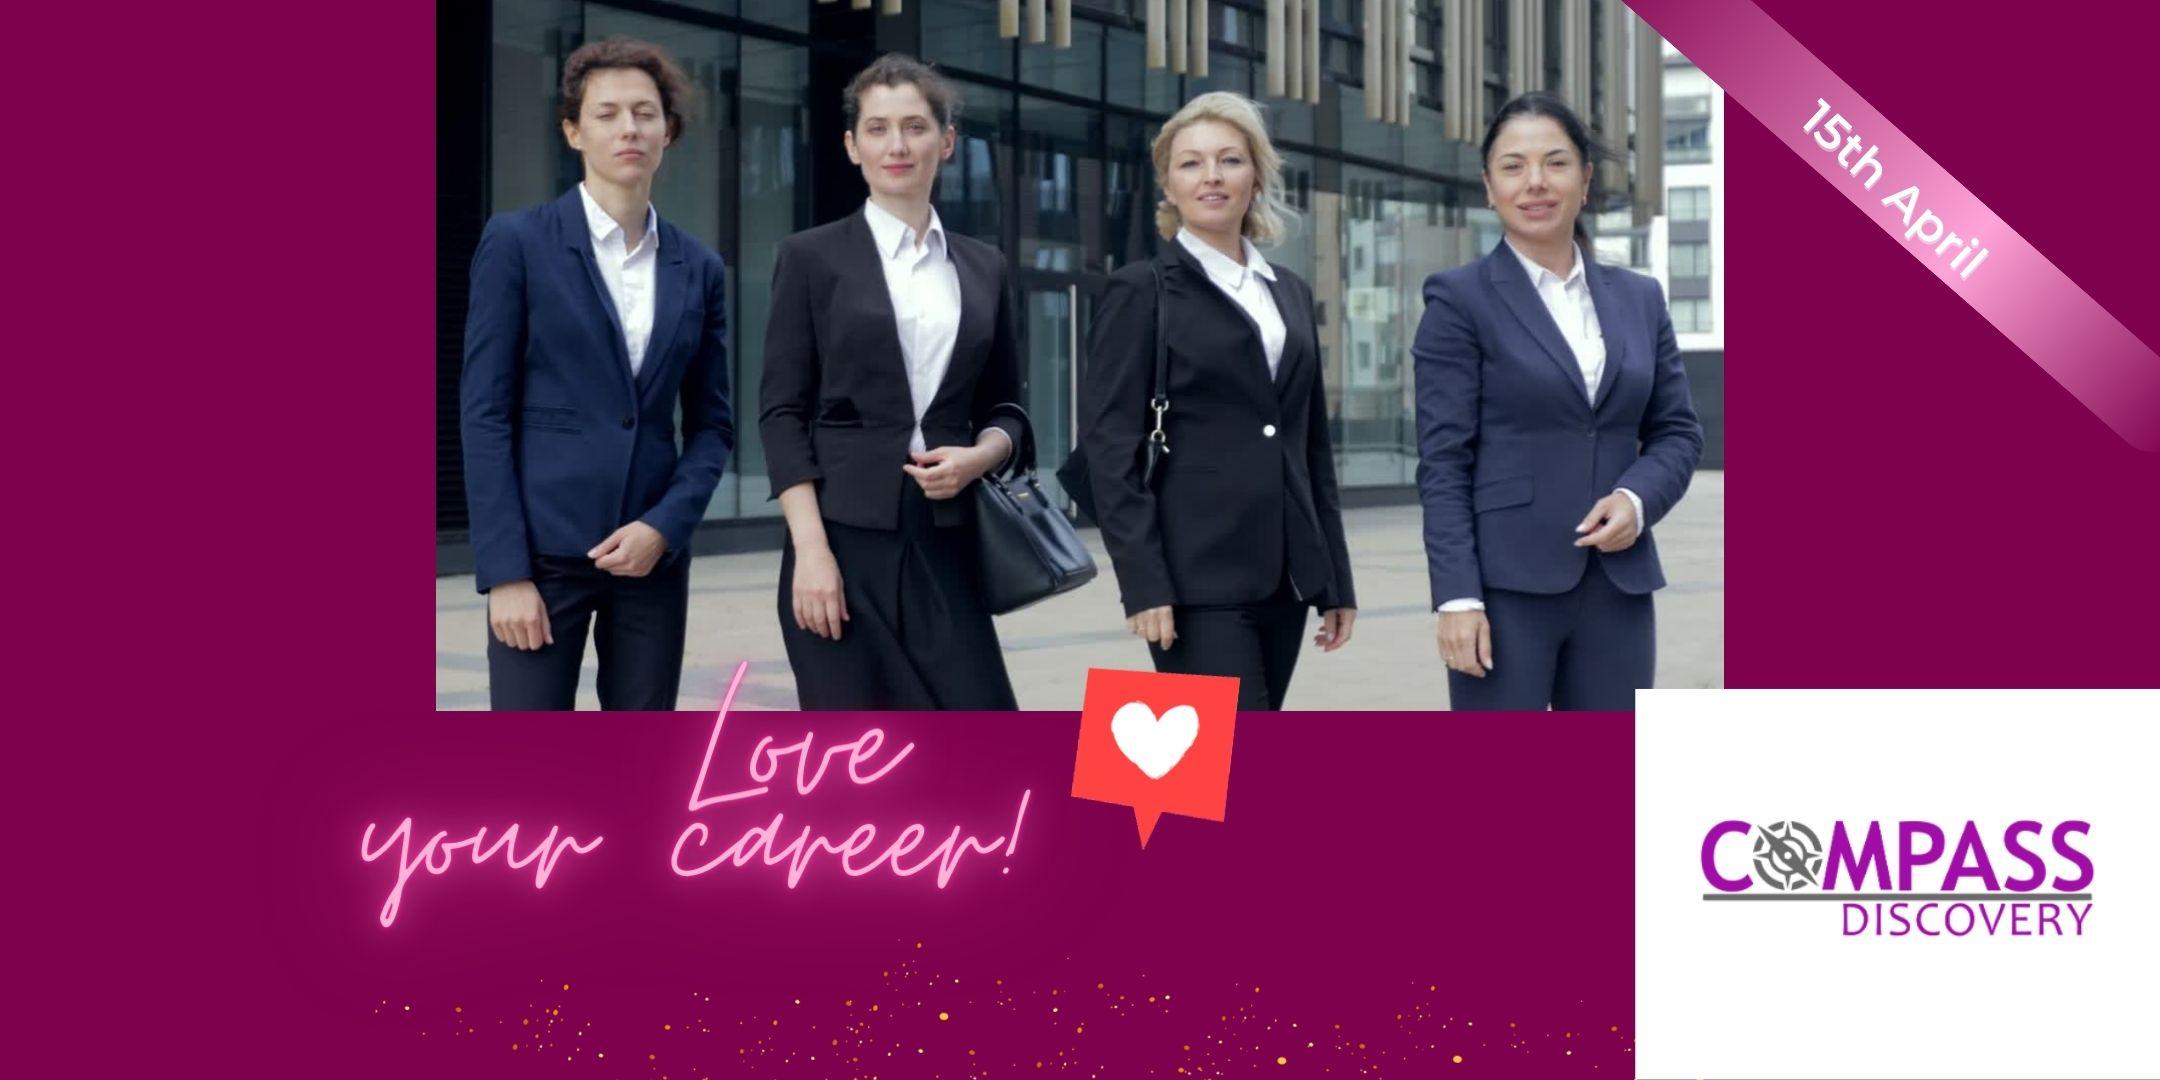 WBL webinar on how to love your career